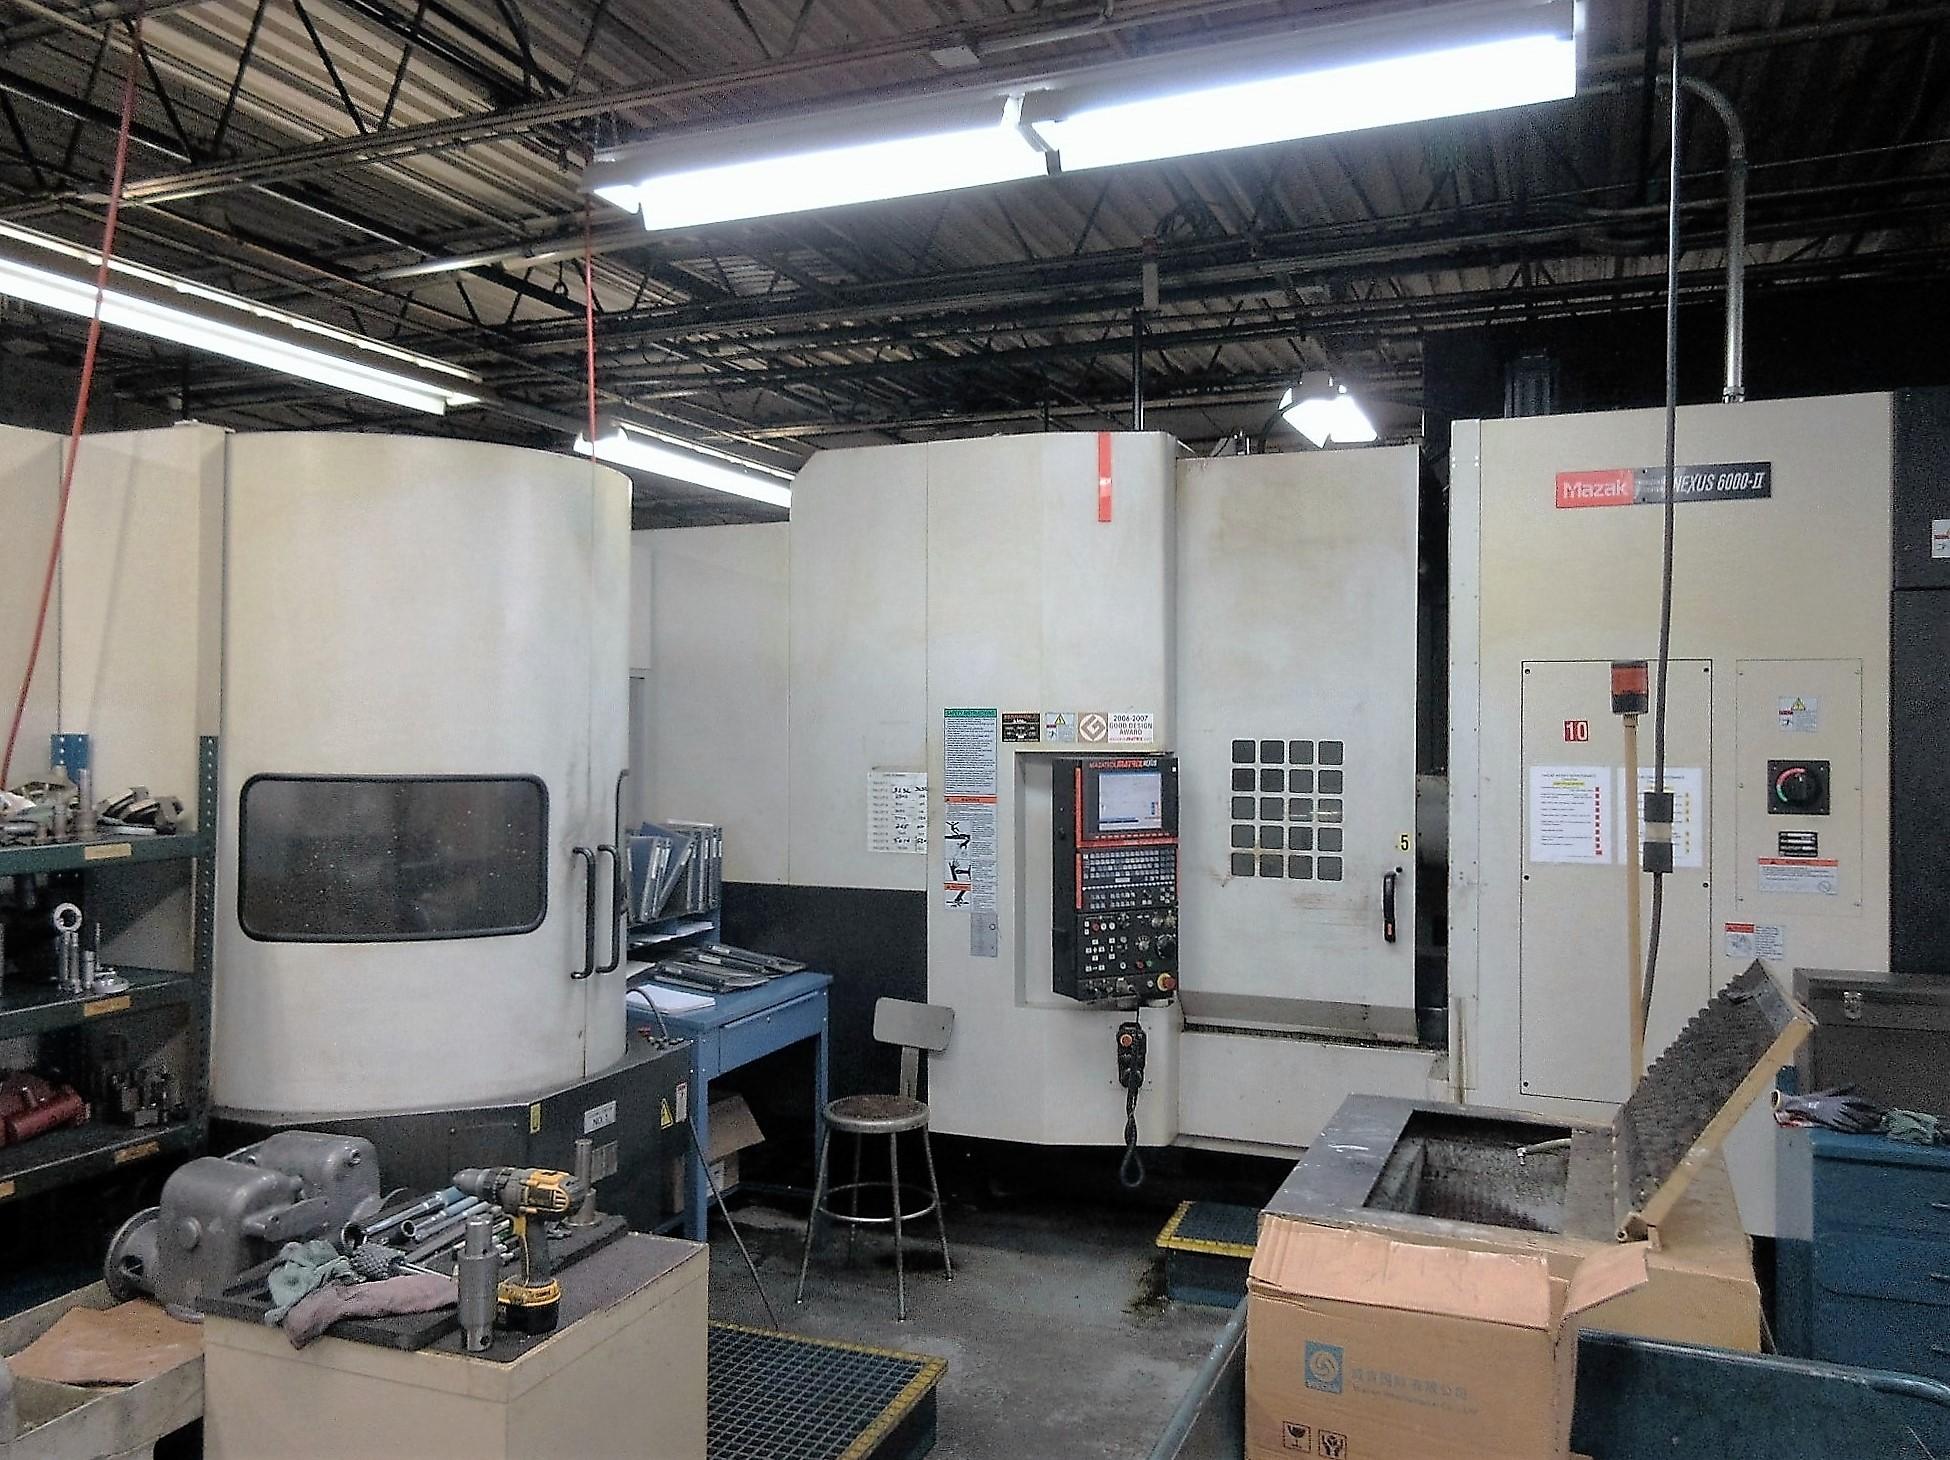 Mazak HCN-6000-II CNC Horizontal Machining Center With Palletech System - Image 2 of 22